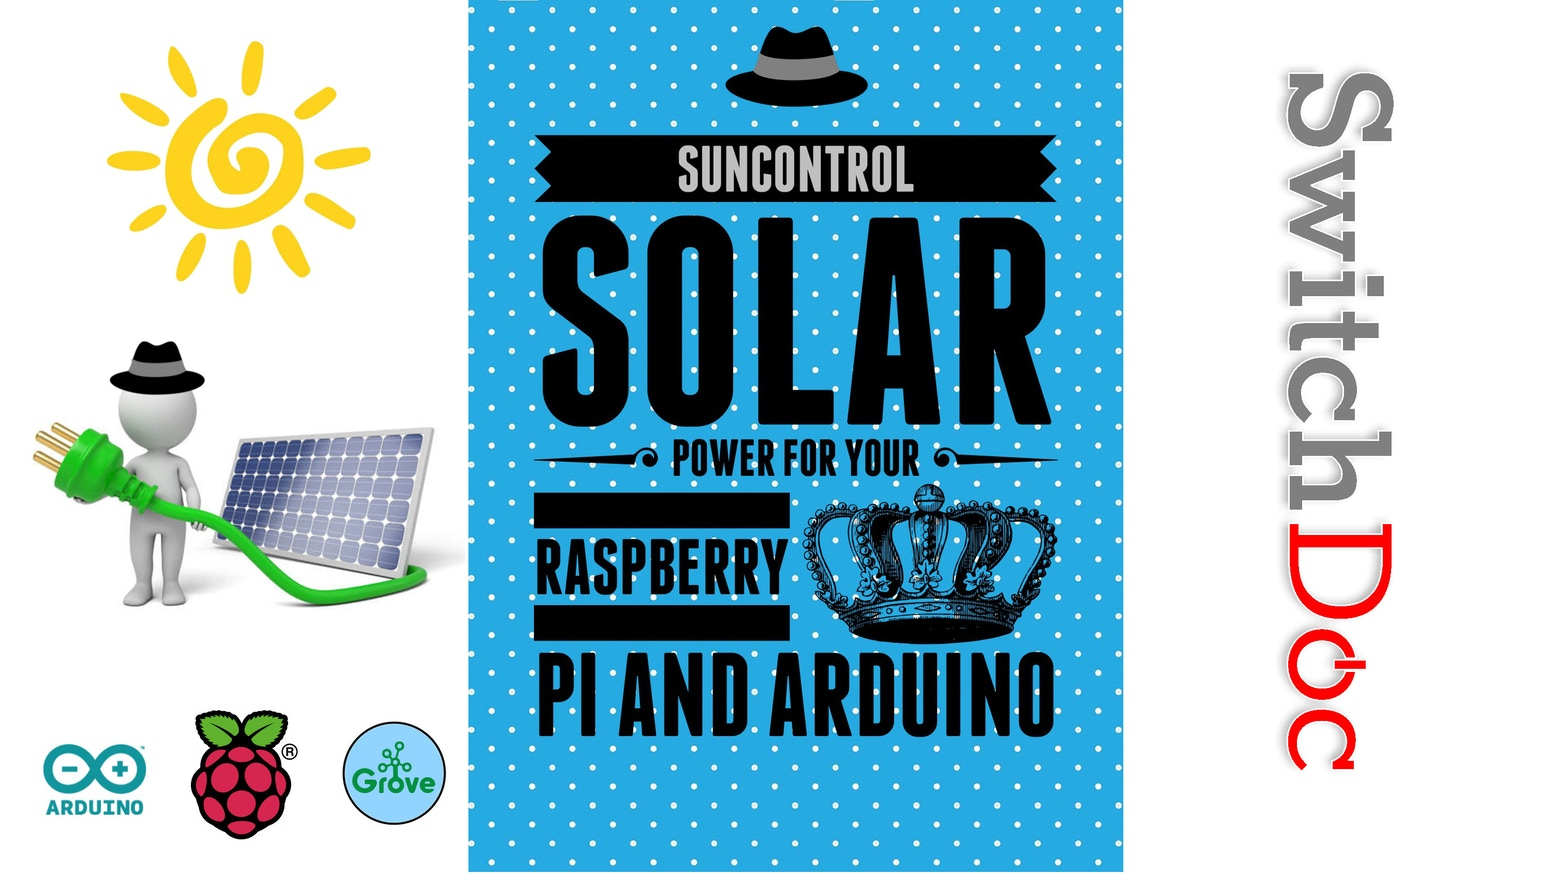 SunControl - DIY Solar Power for the Raspberry Pi / Arduino by ...